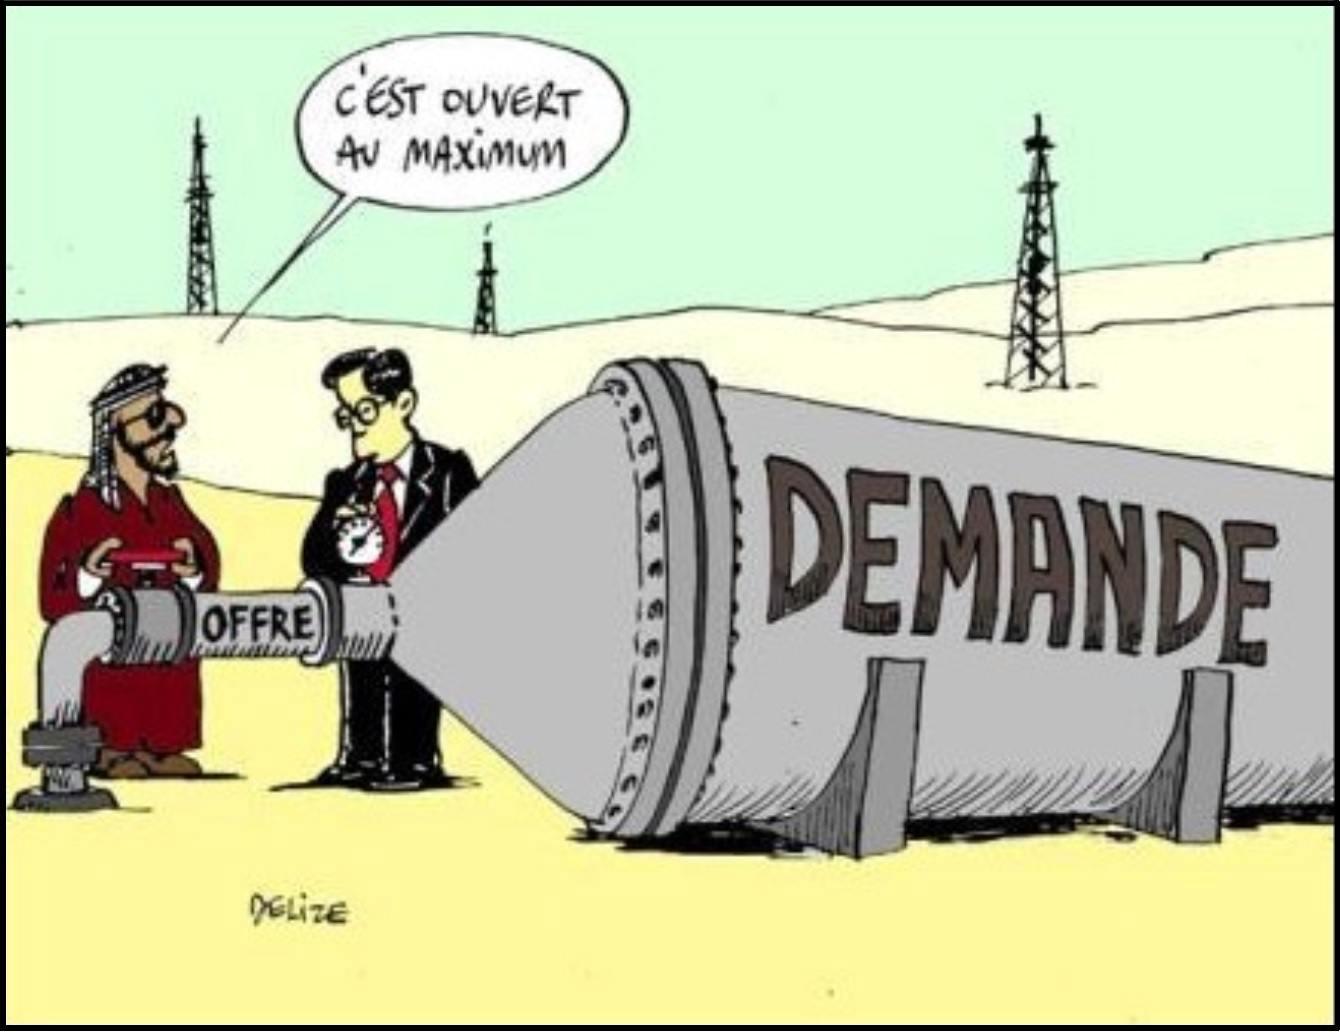 Petrole-.jpg